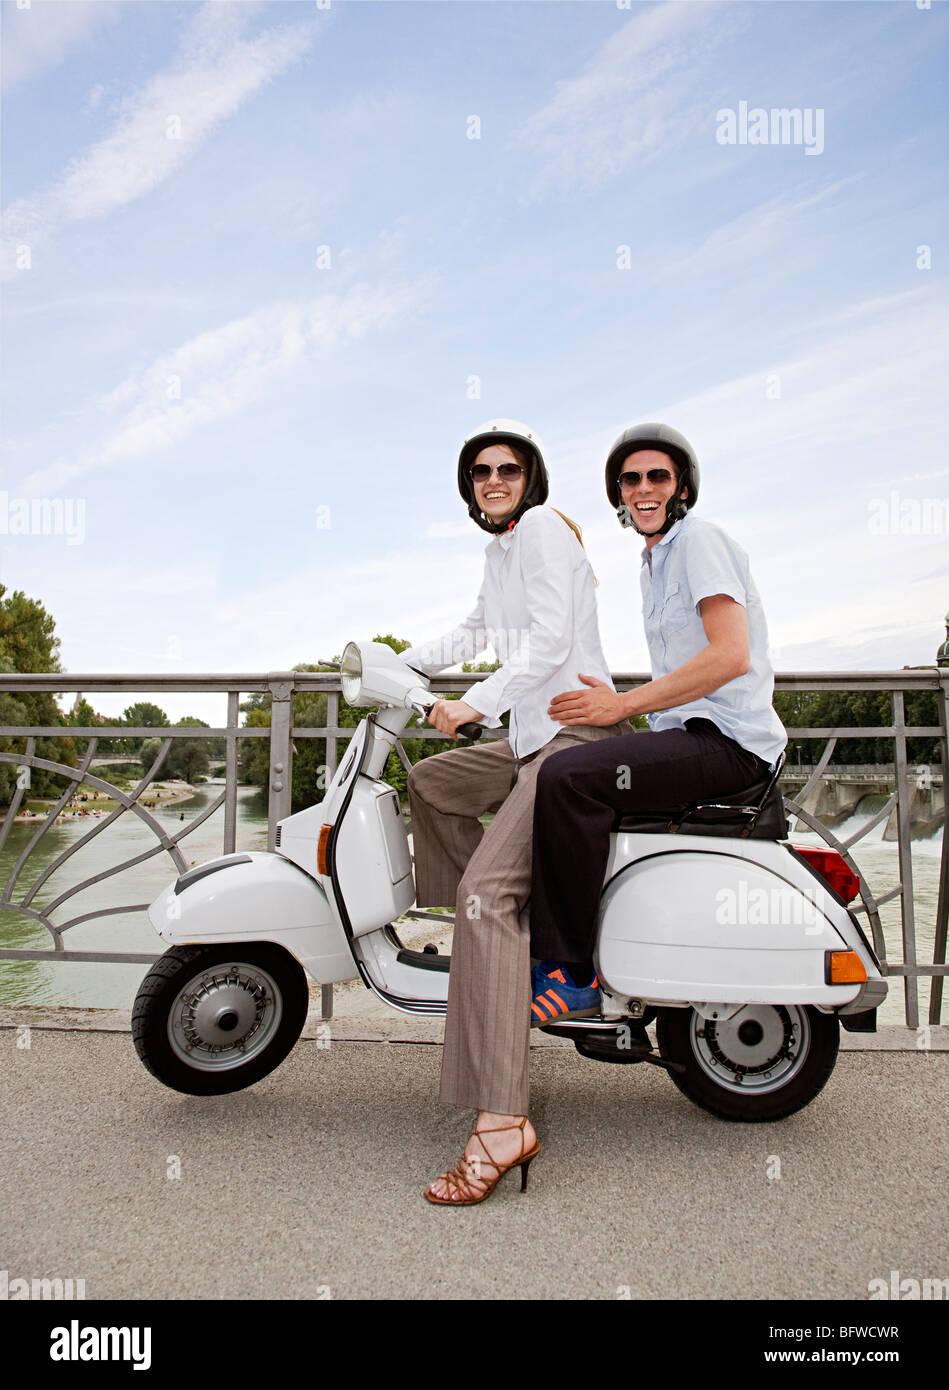 couple on scooter on bridge - Stock Image